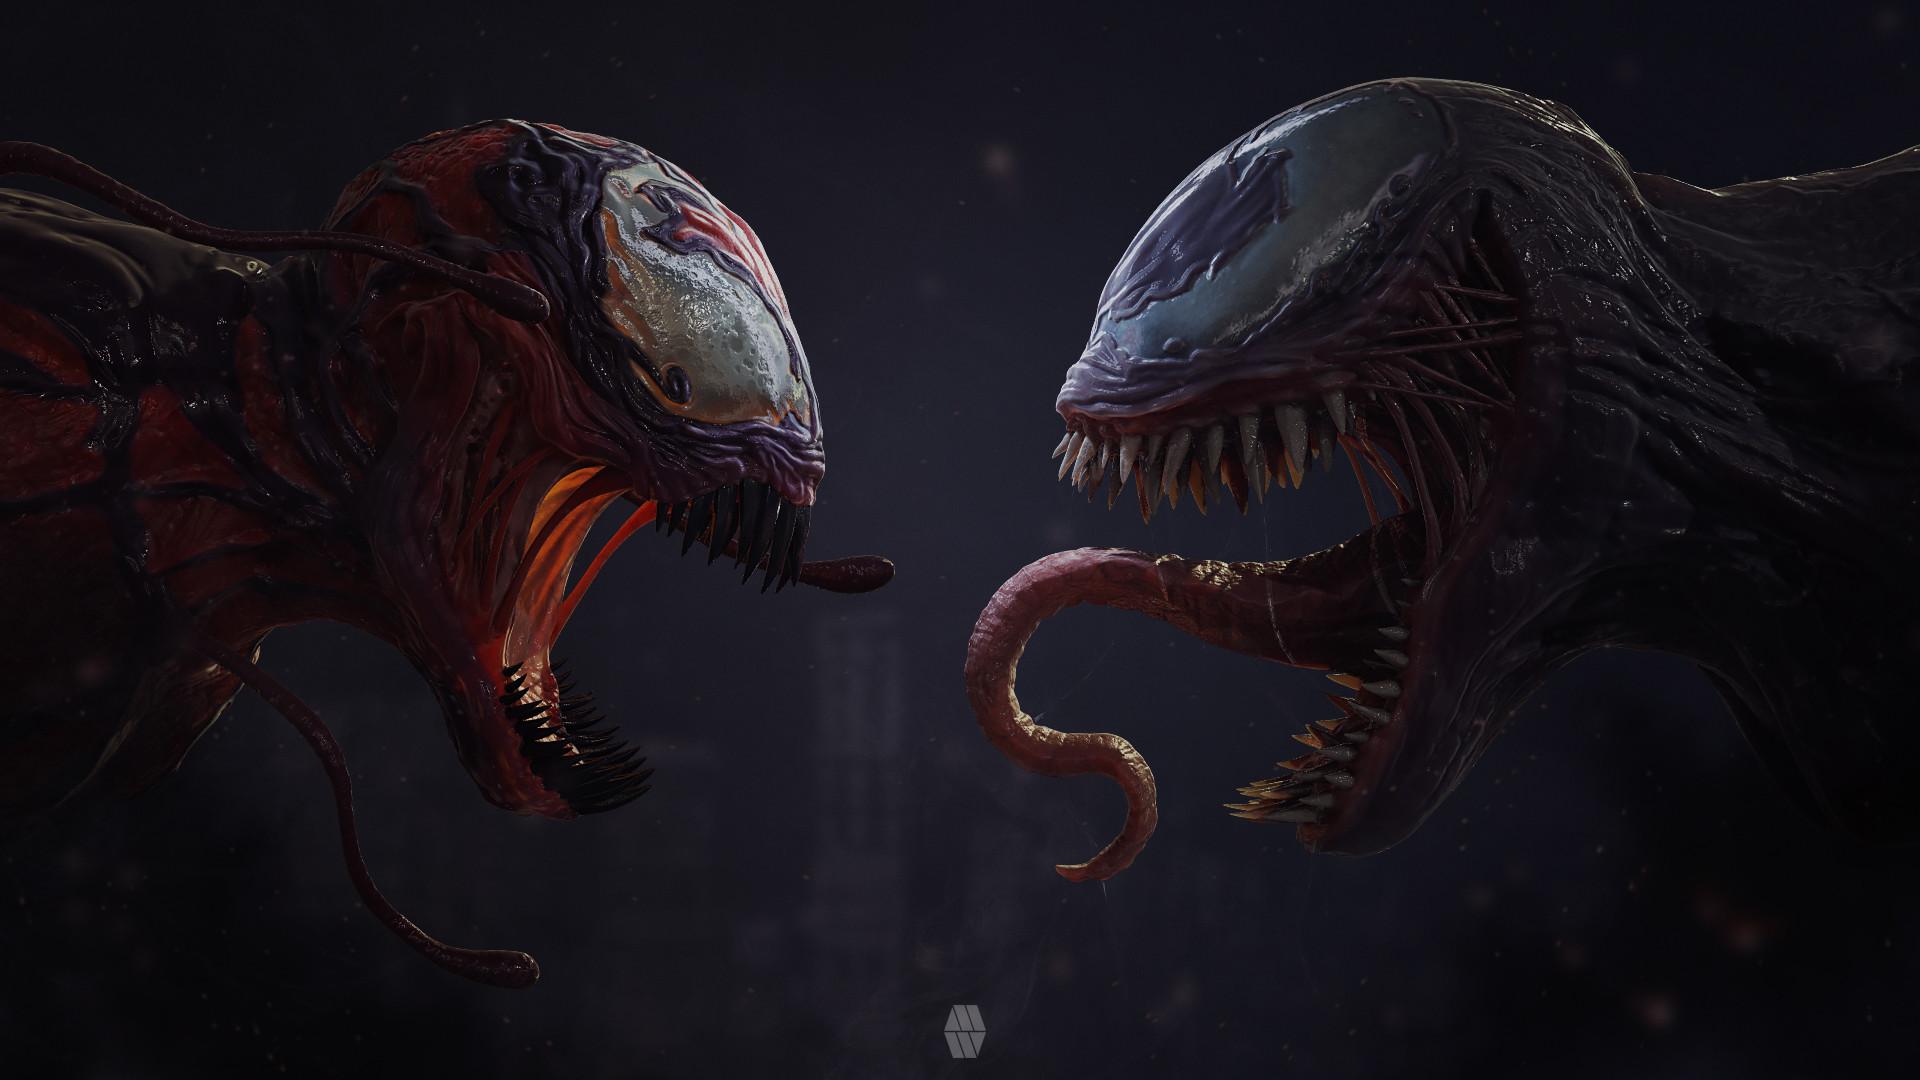 Carnage Meets Venom, HD Superheroes, 4k Wallpapers, Images ...